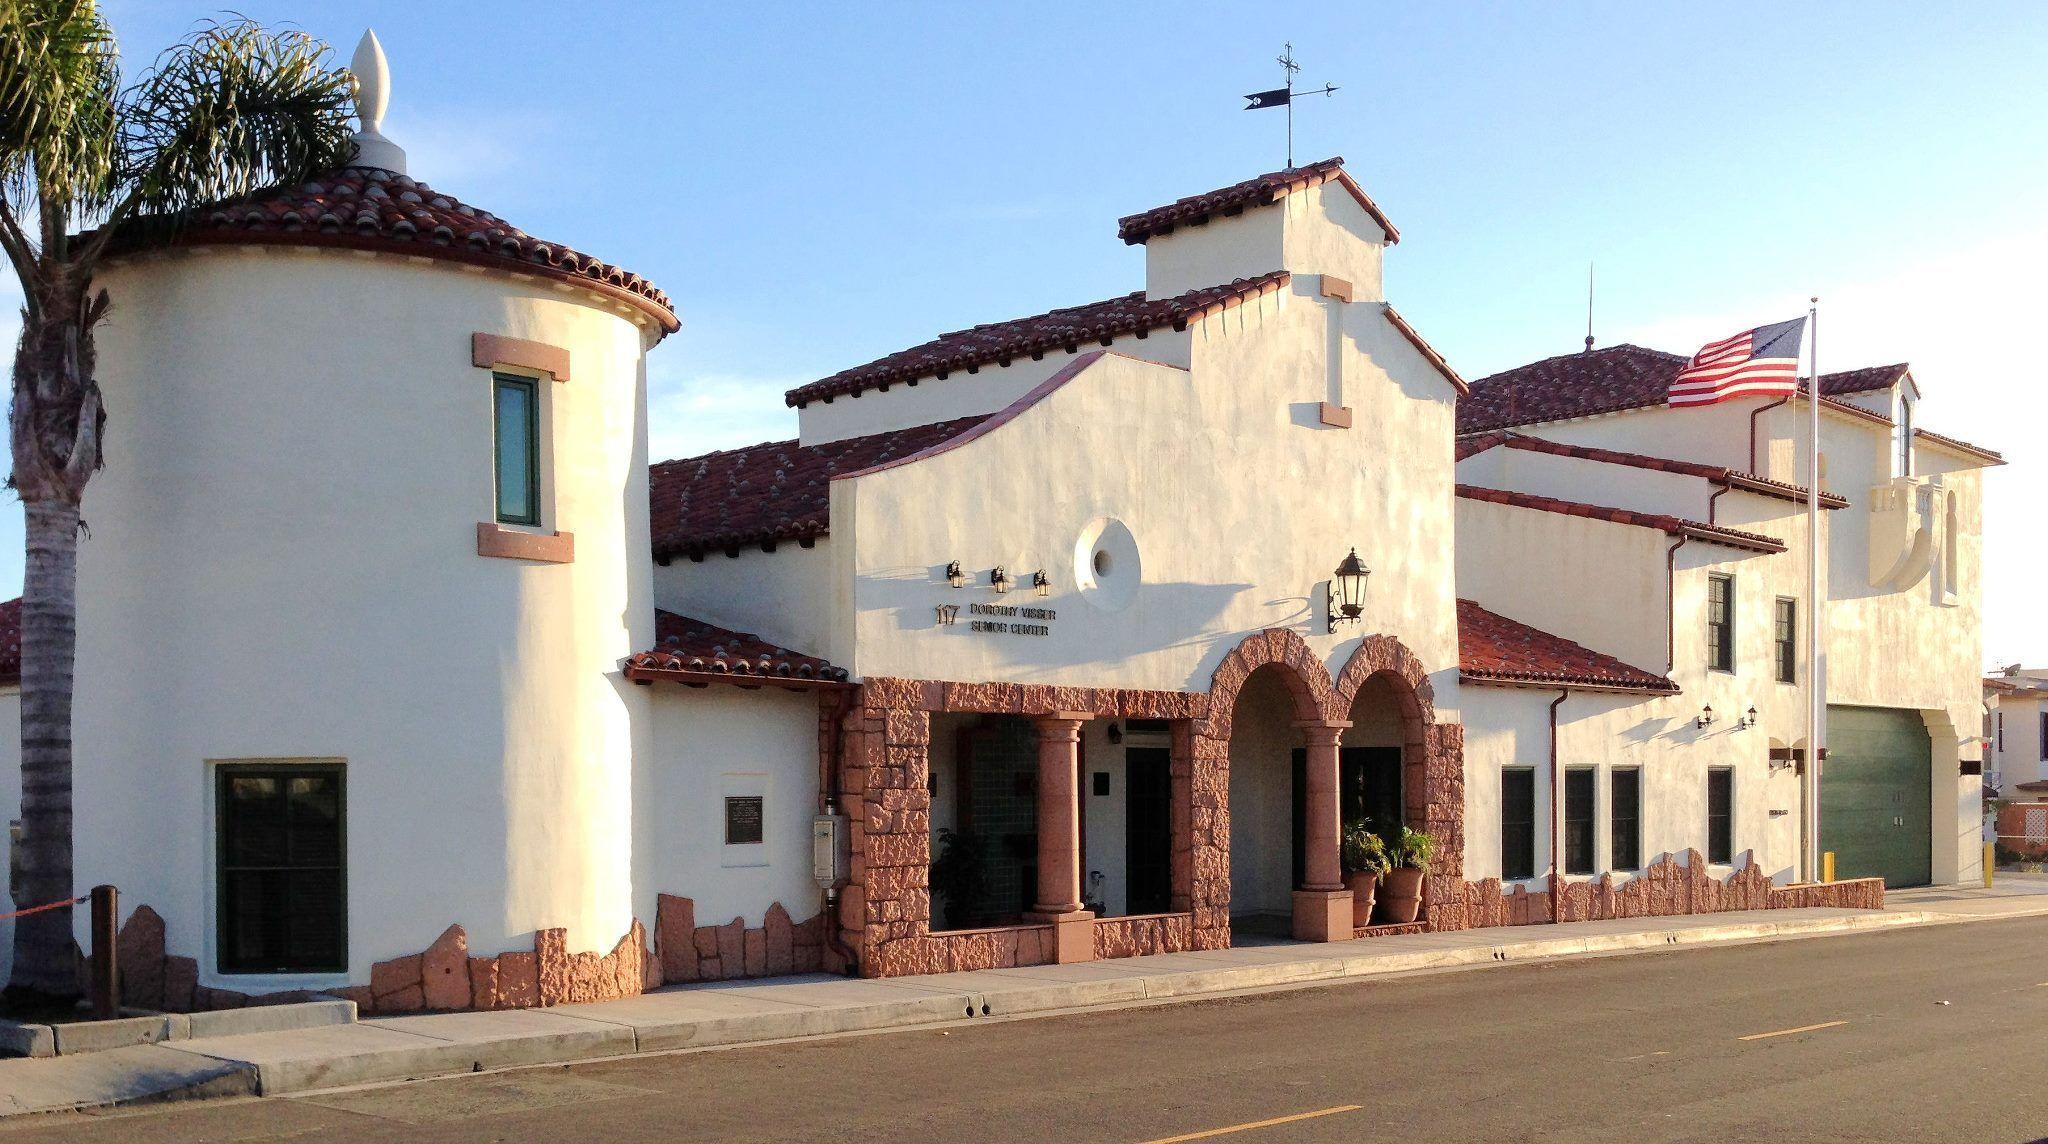 San Clemente Senior Center